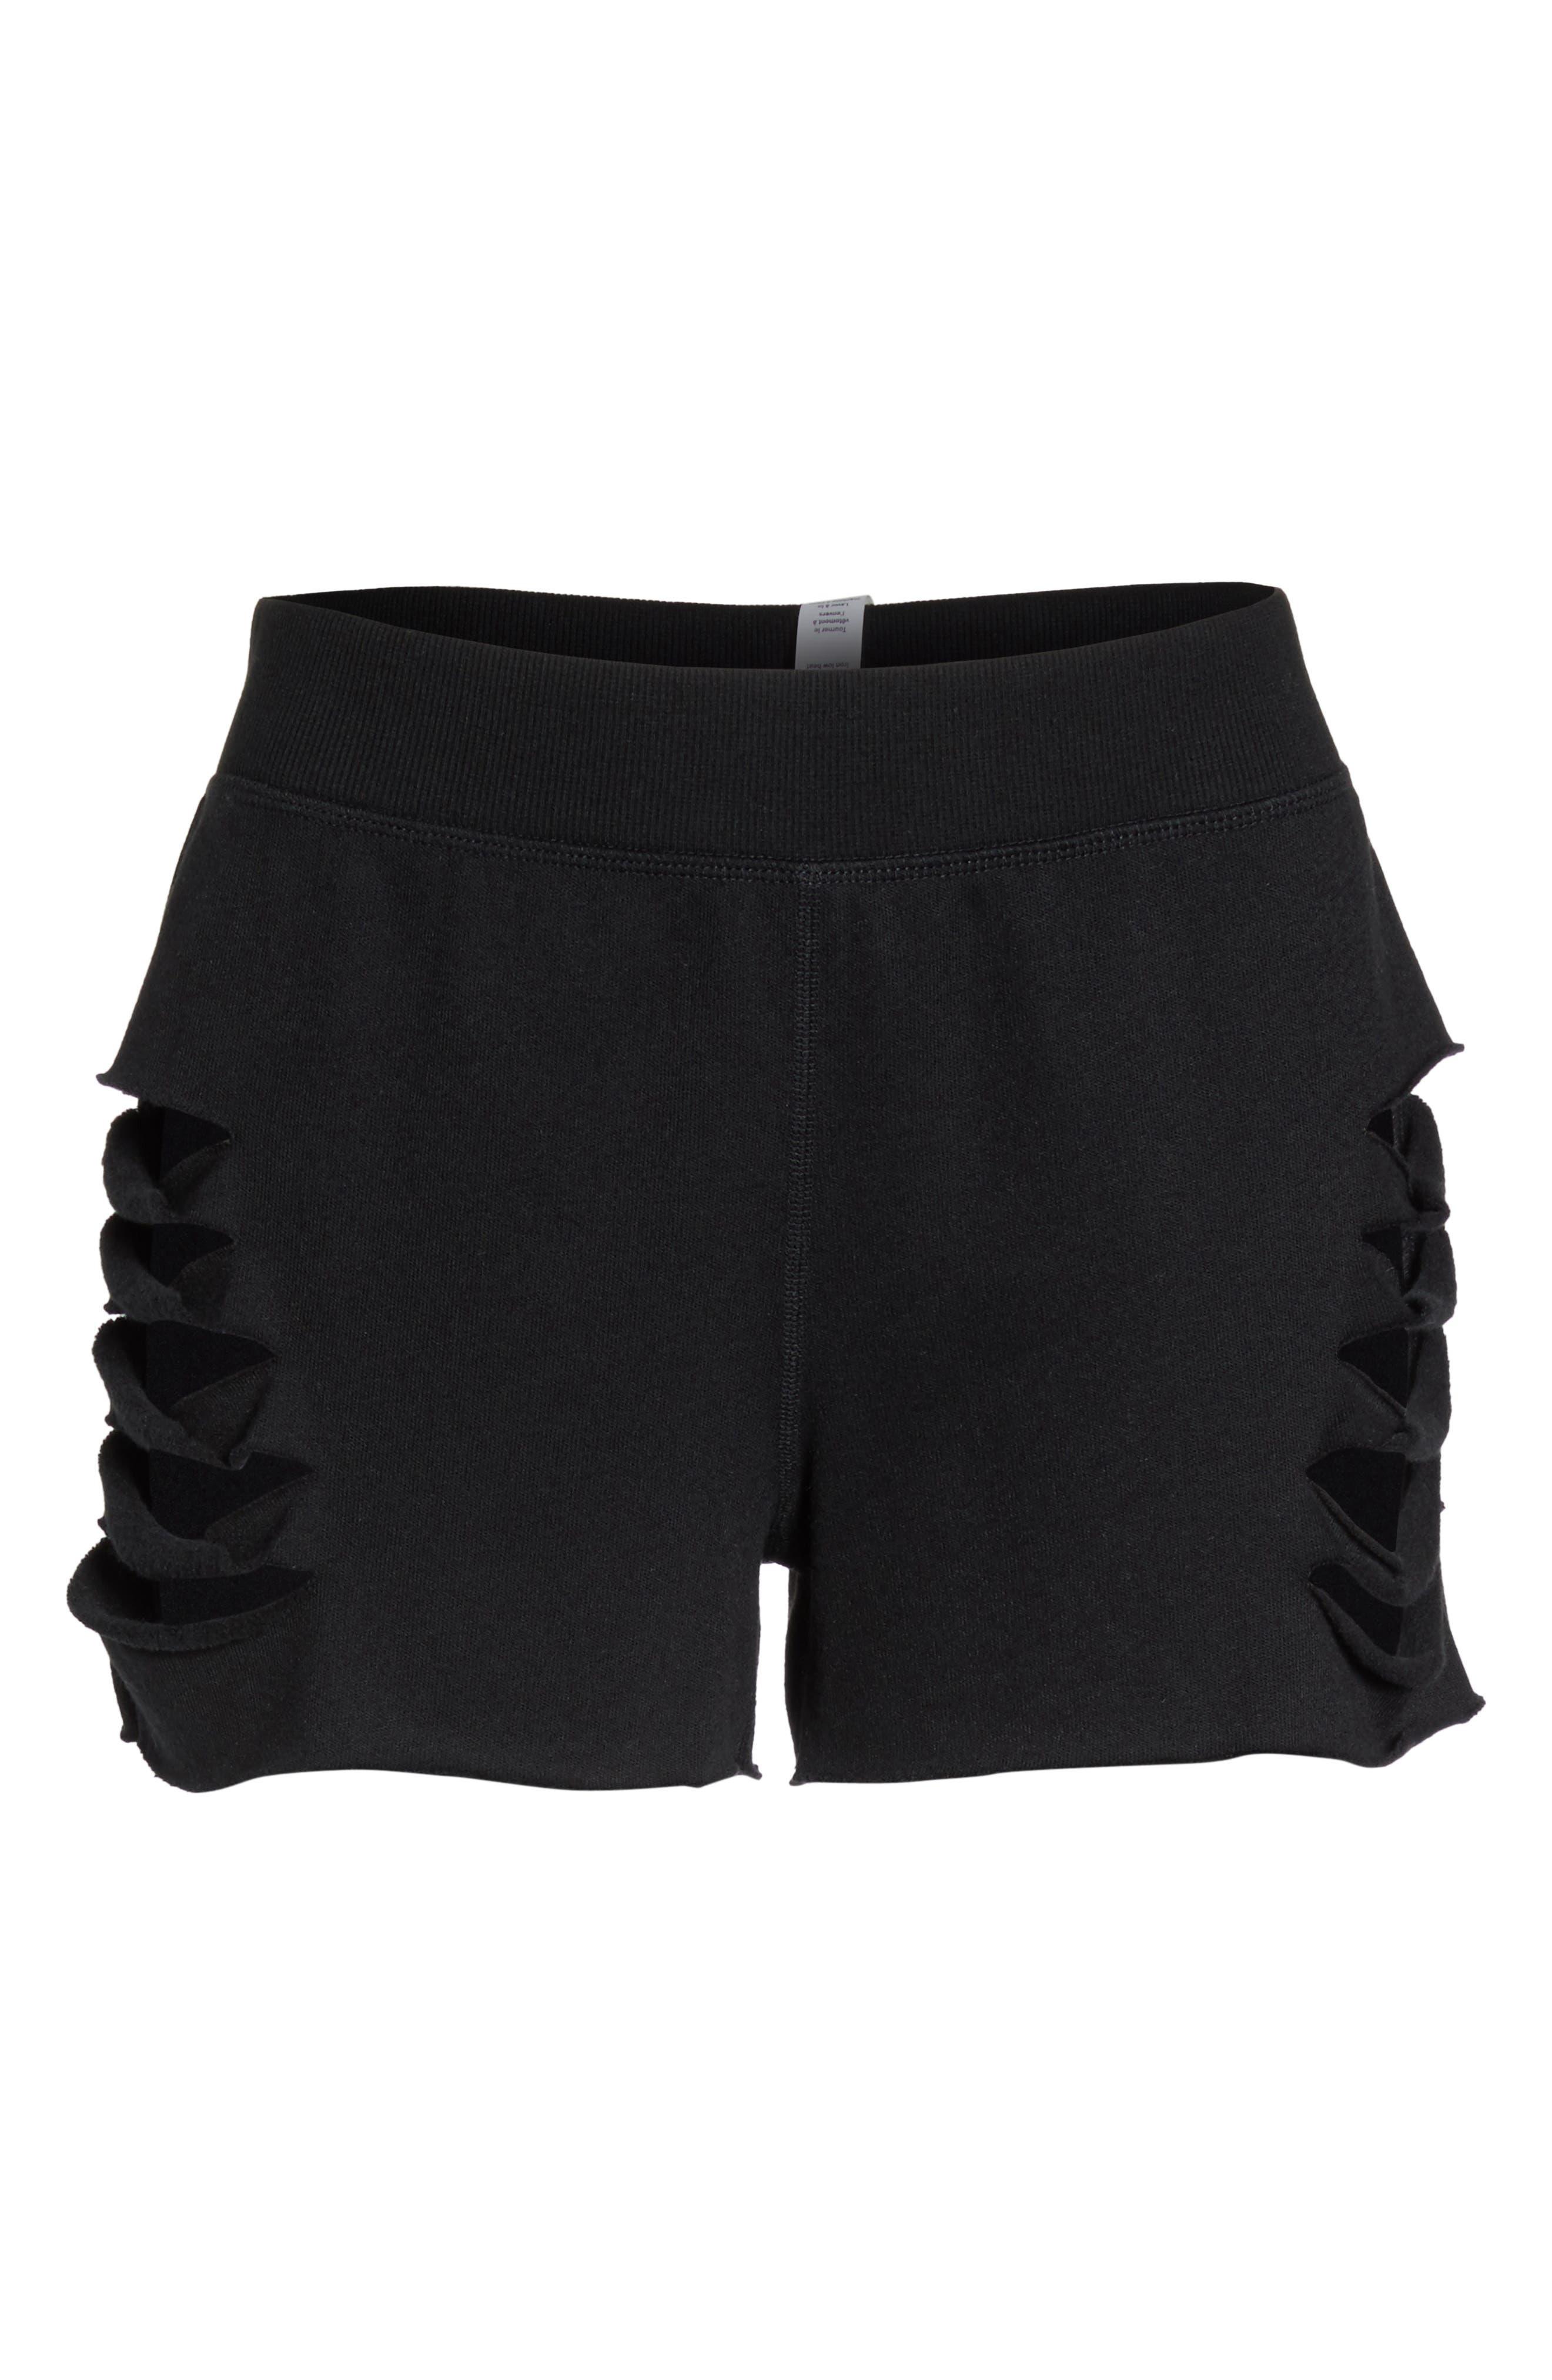 Slay Shorts,                             Alternate thumbnail 7, color,                             Black